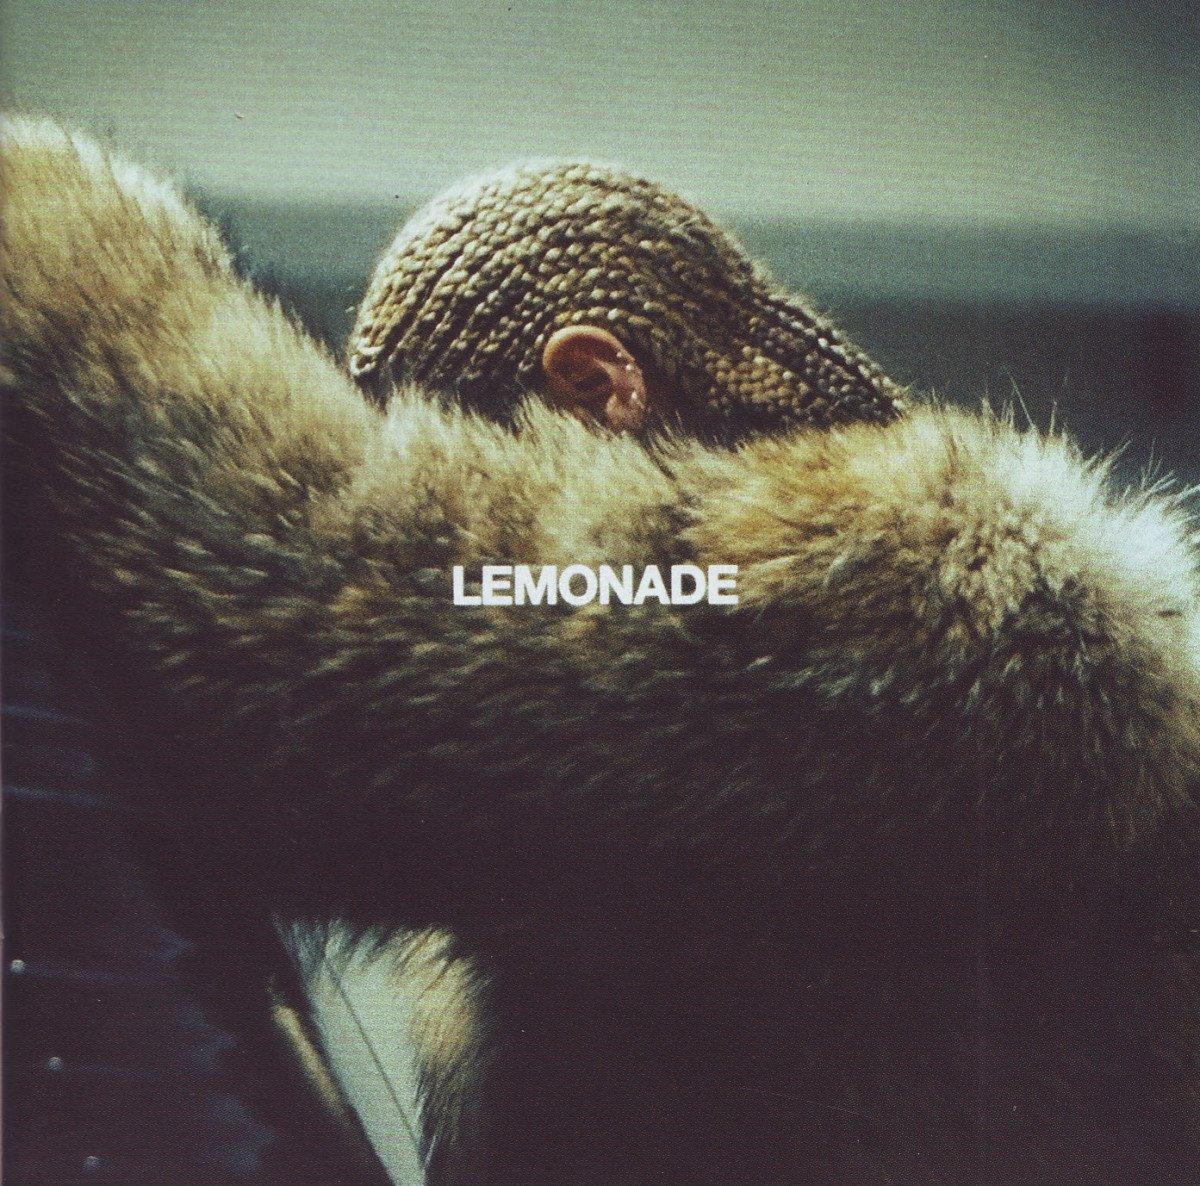 Lemonade by CD